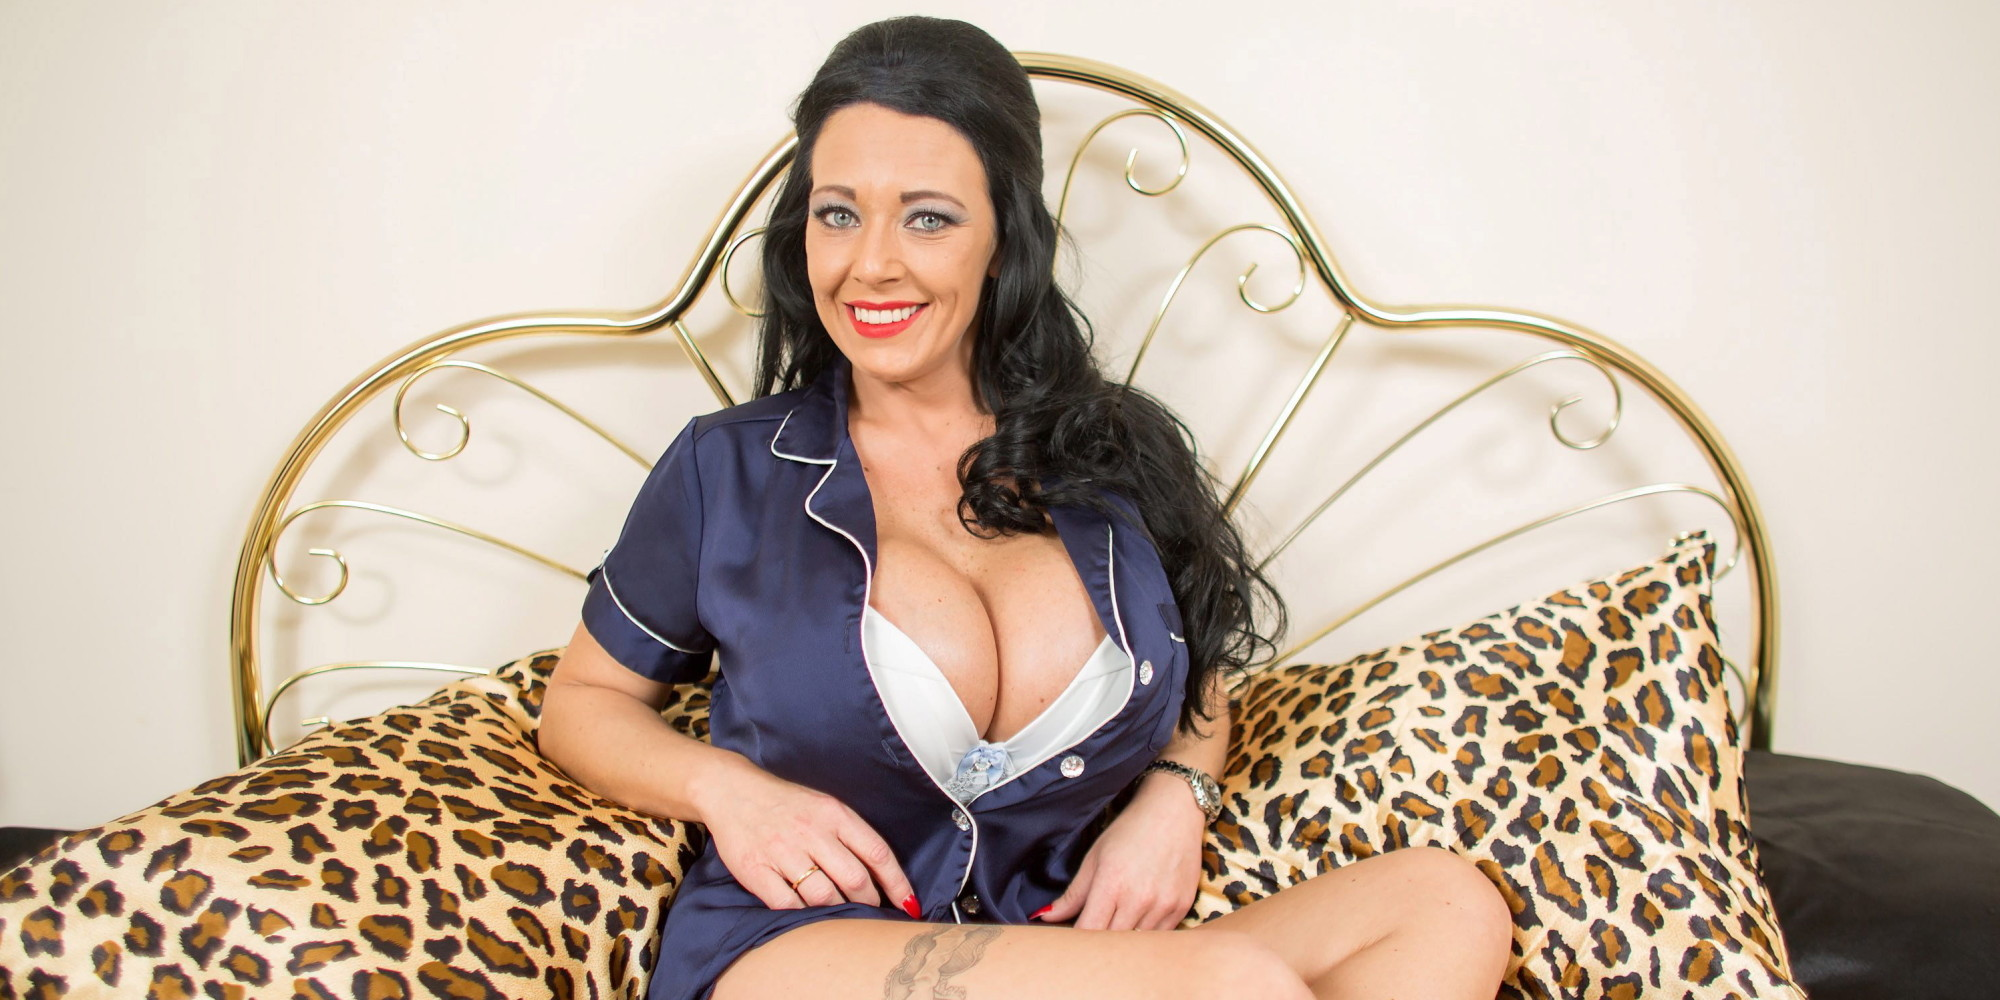 Debbie Delamar Has Britains Largest Fake Breasts